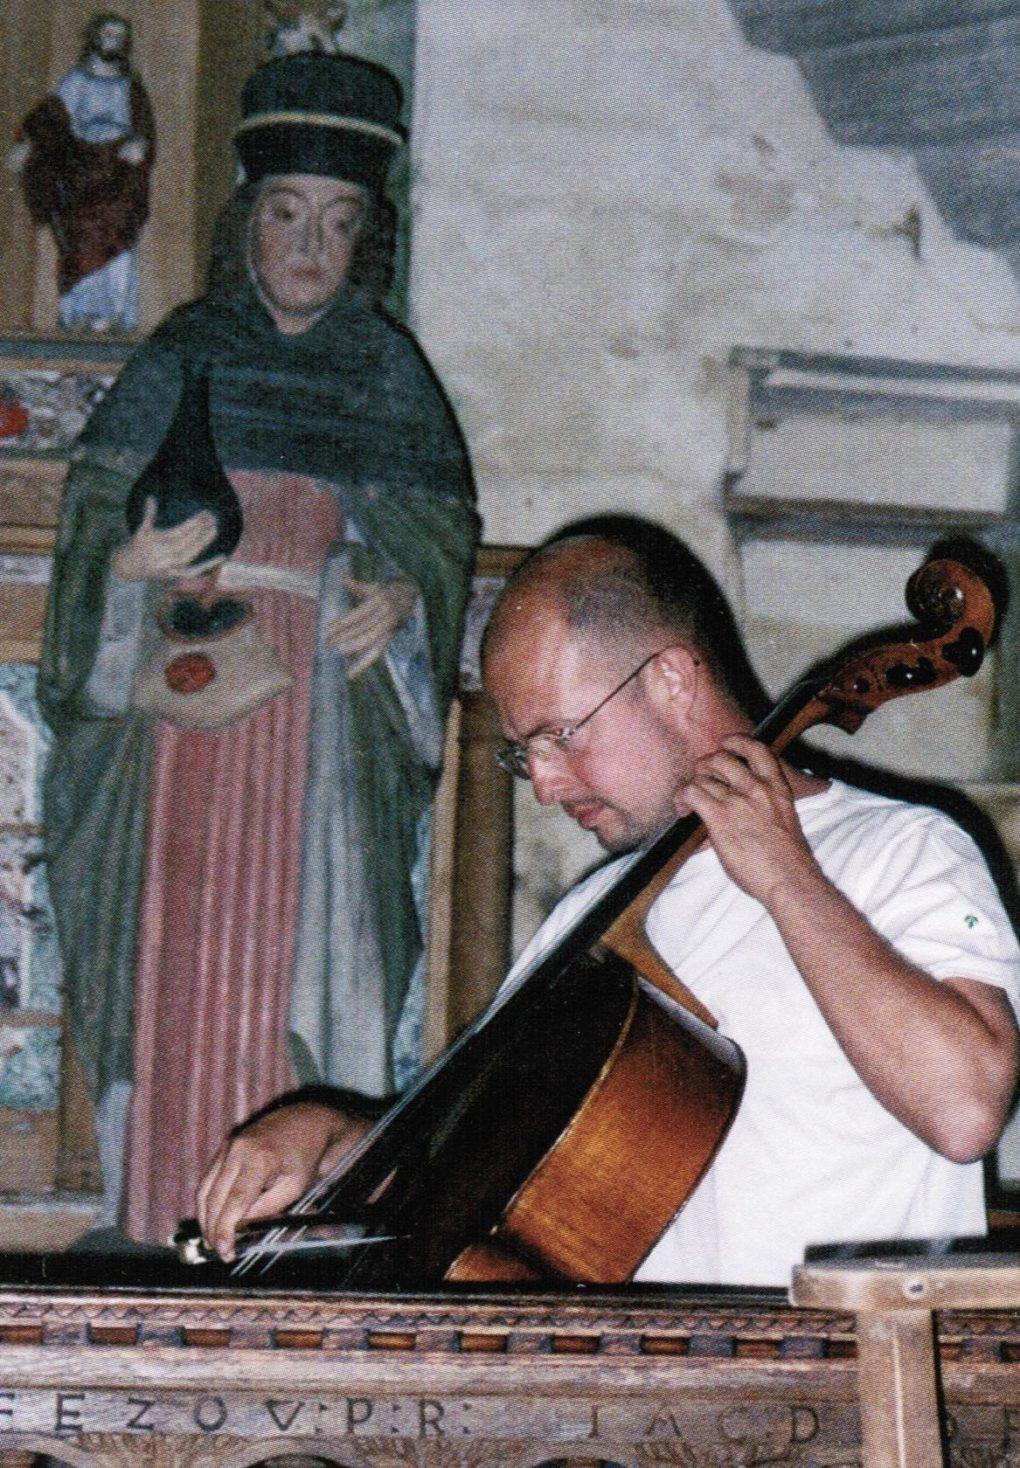 XVIe concert Christoph Saint-Nic